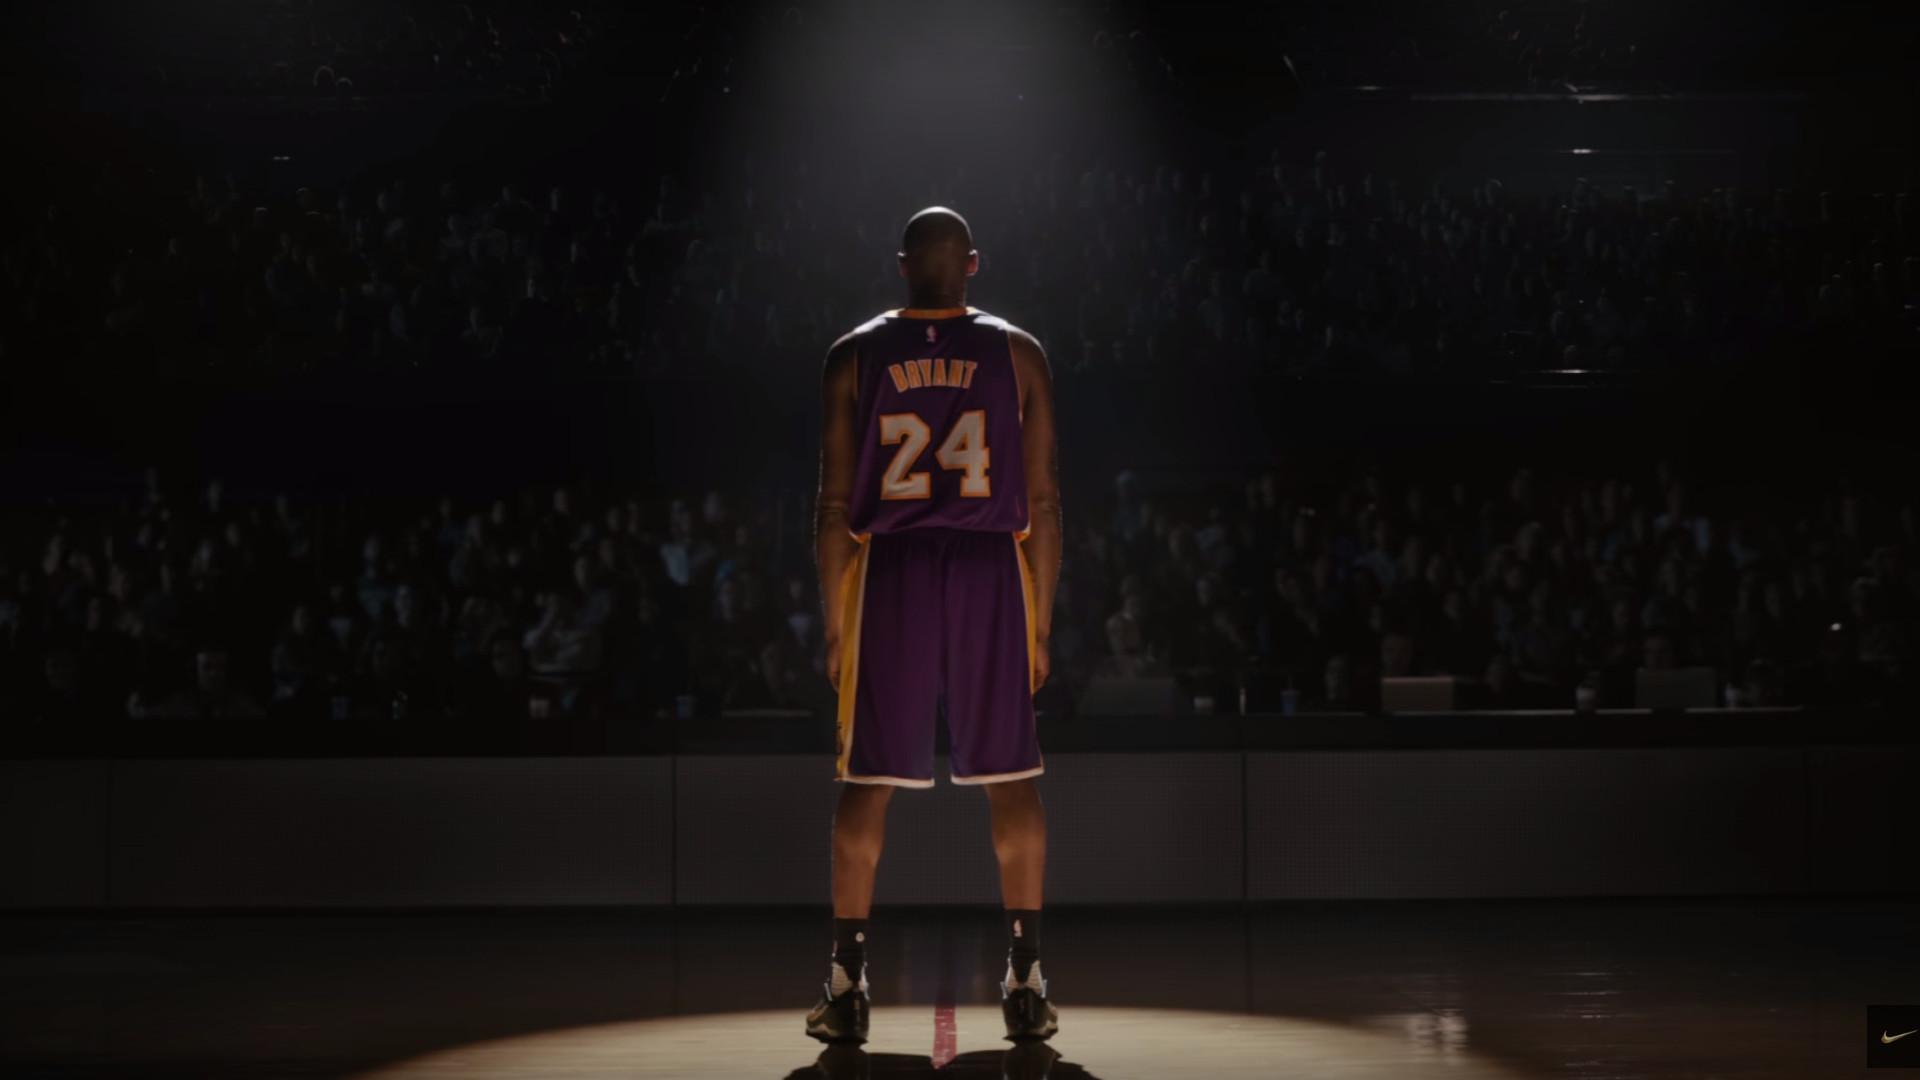 Kobe Bryant Nike Wallpaper 72 Pictures